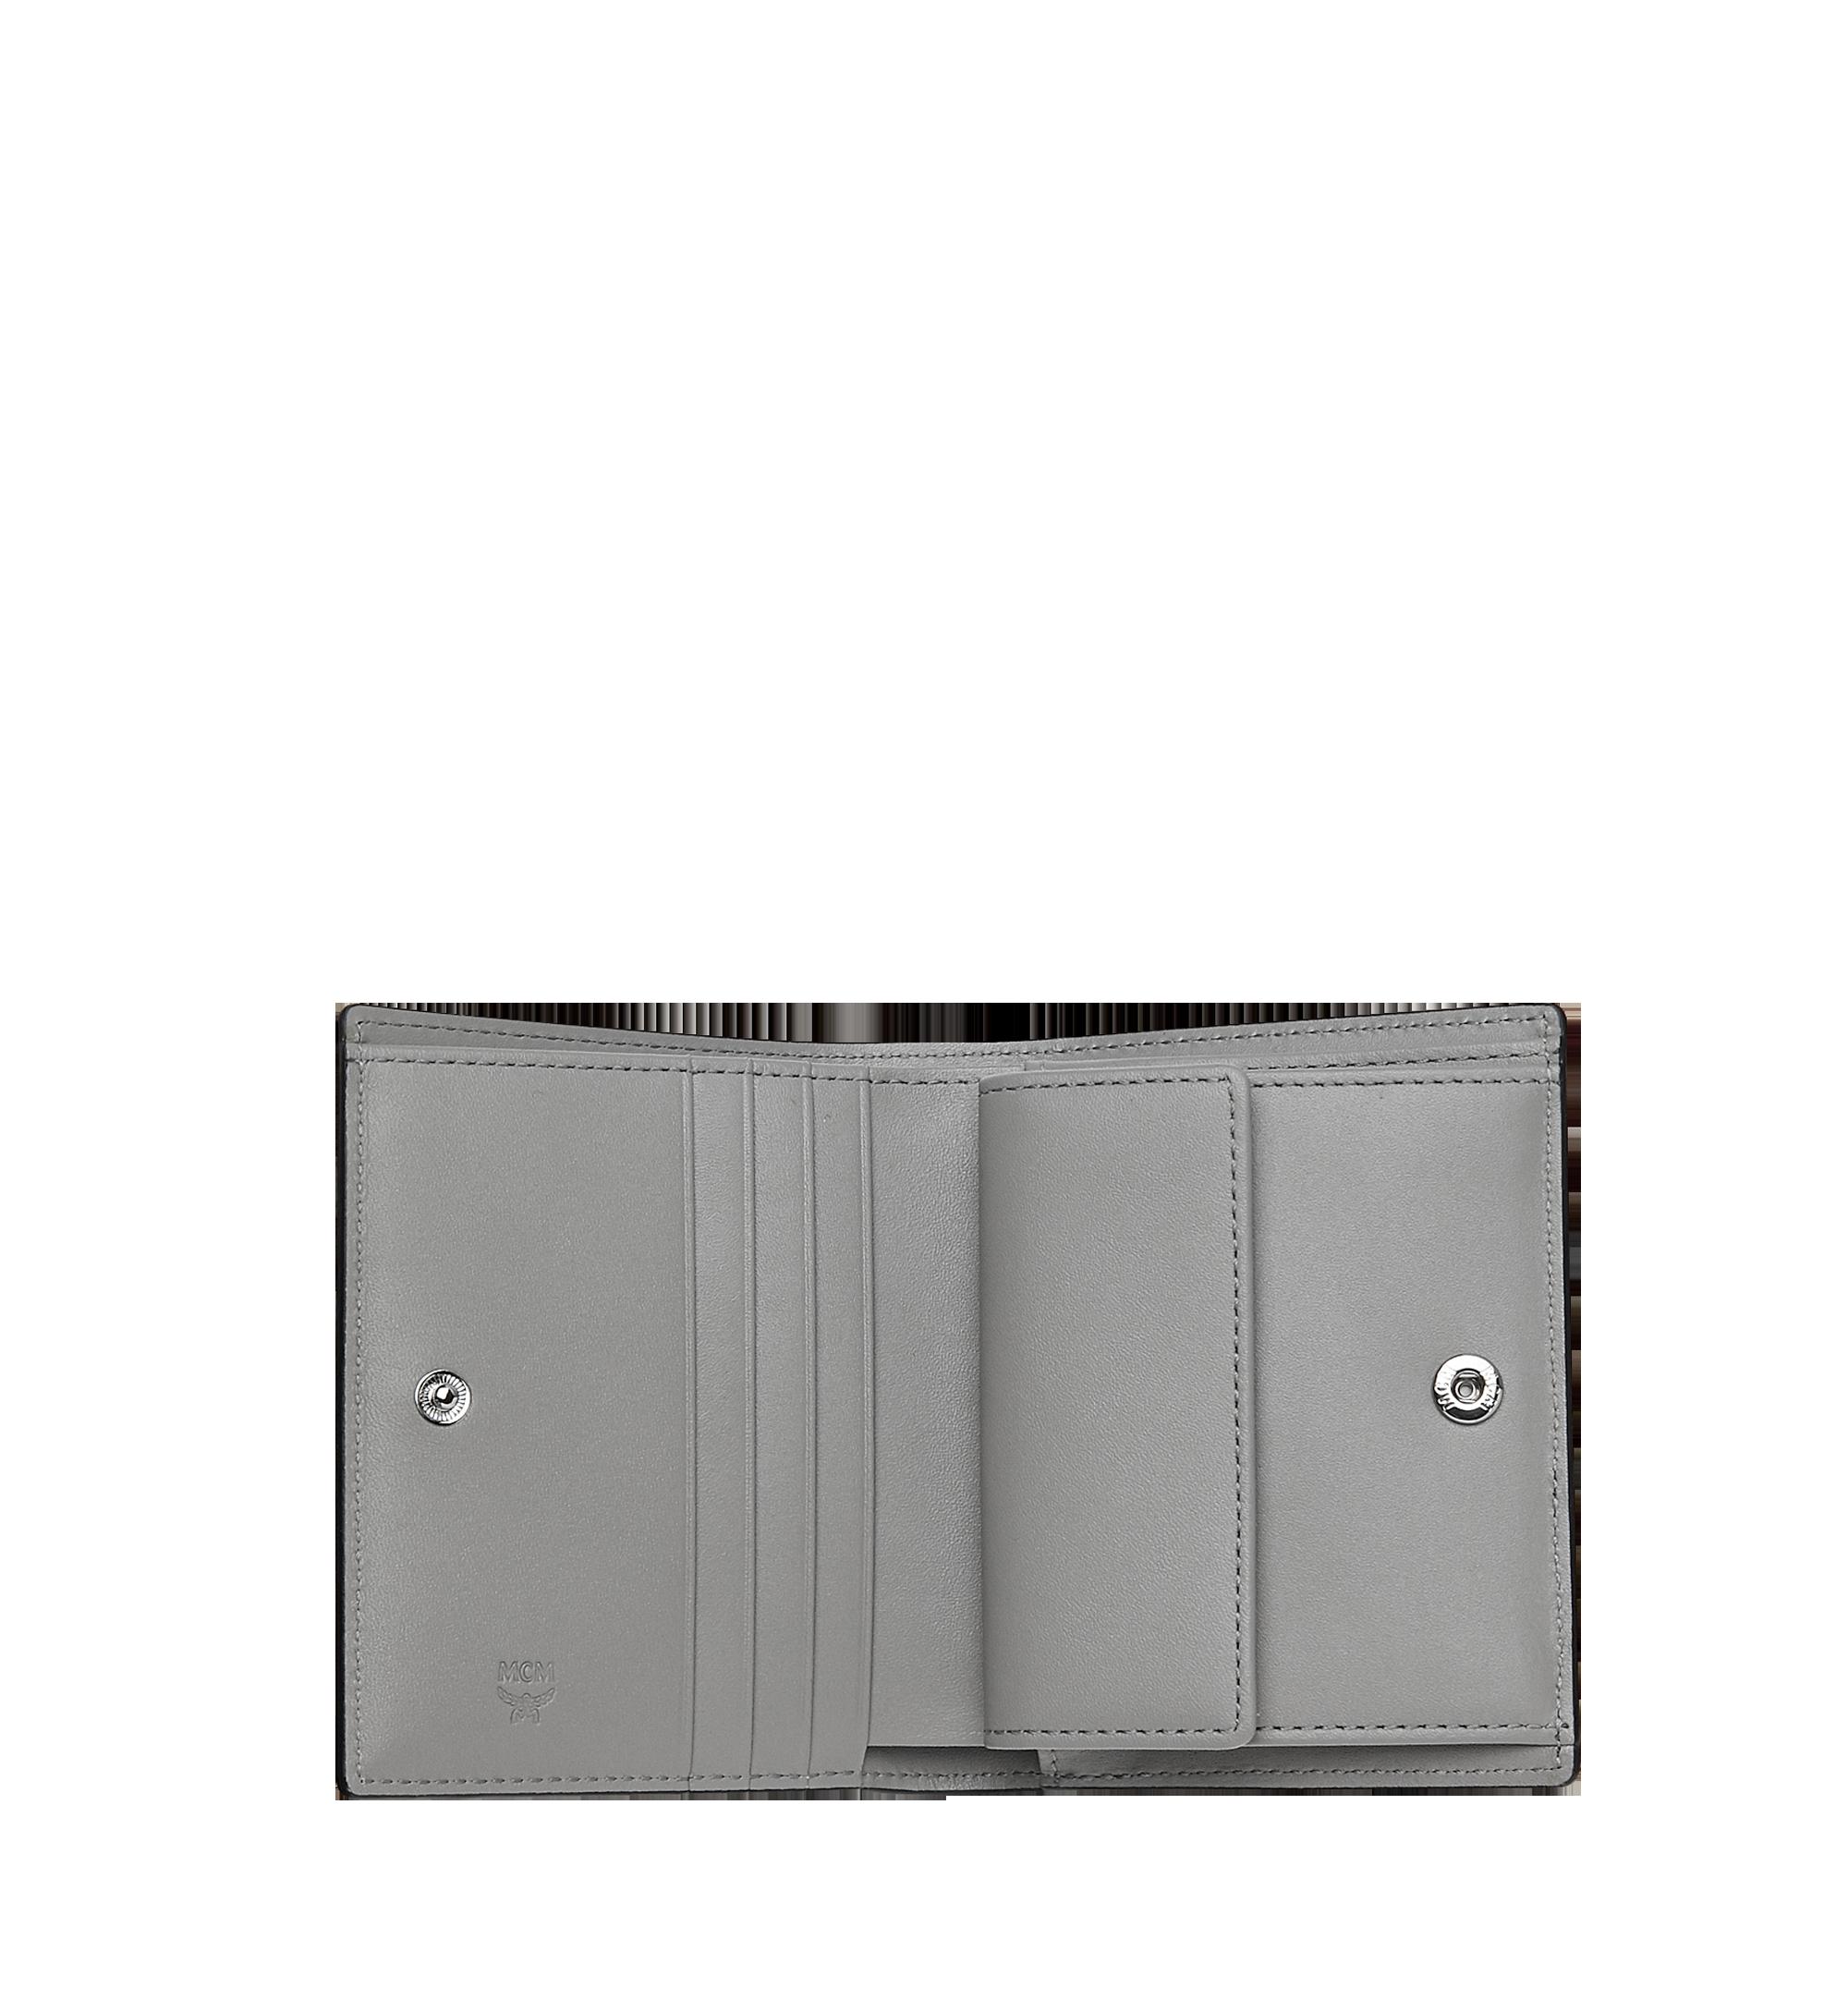 MCM Two-Fold Flat Wallet in Monogram Patent Leather Grey MYS9SPM04EG001 Alternate View 4